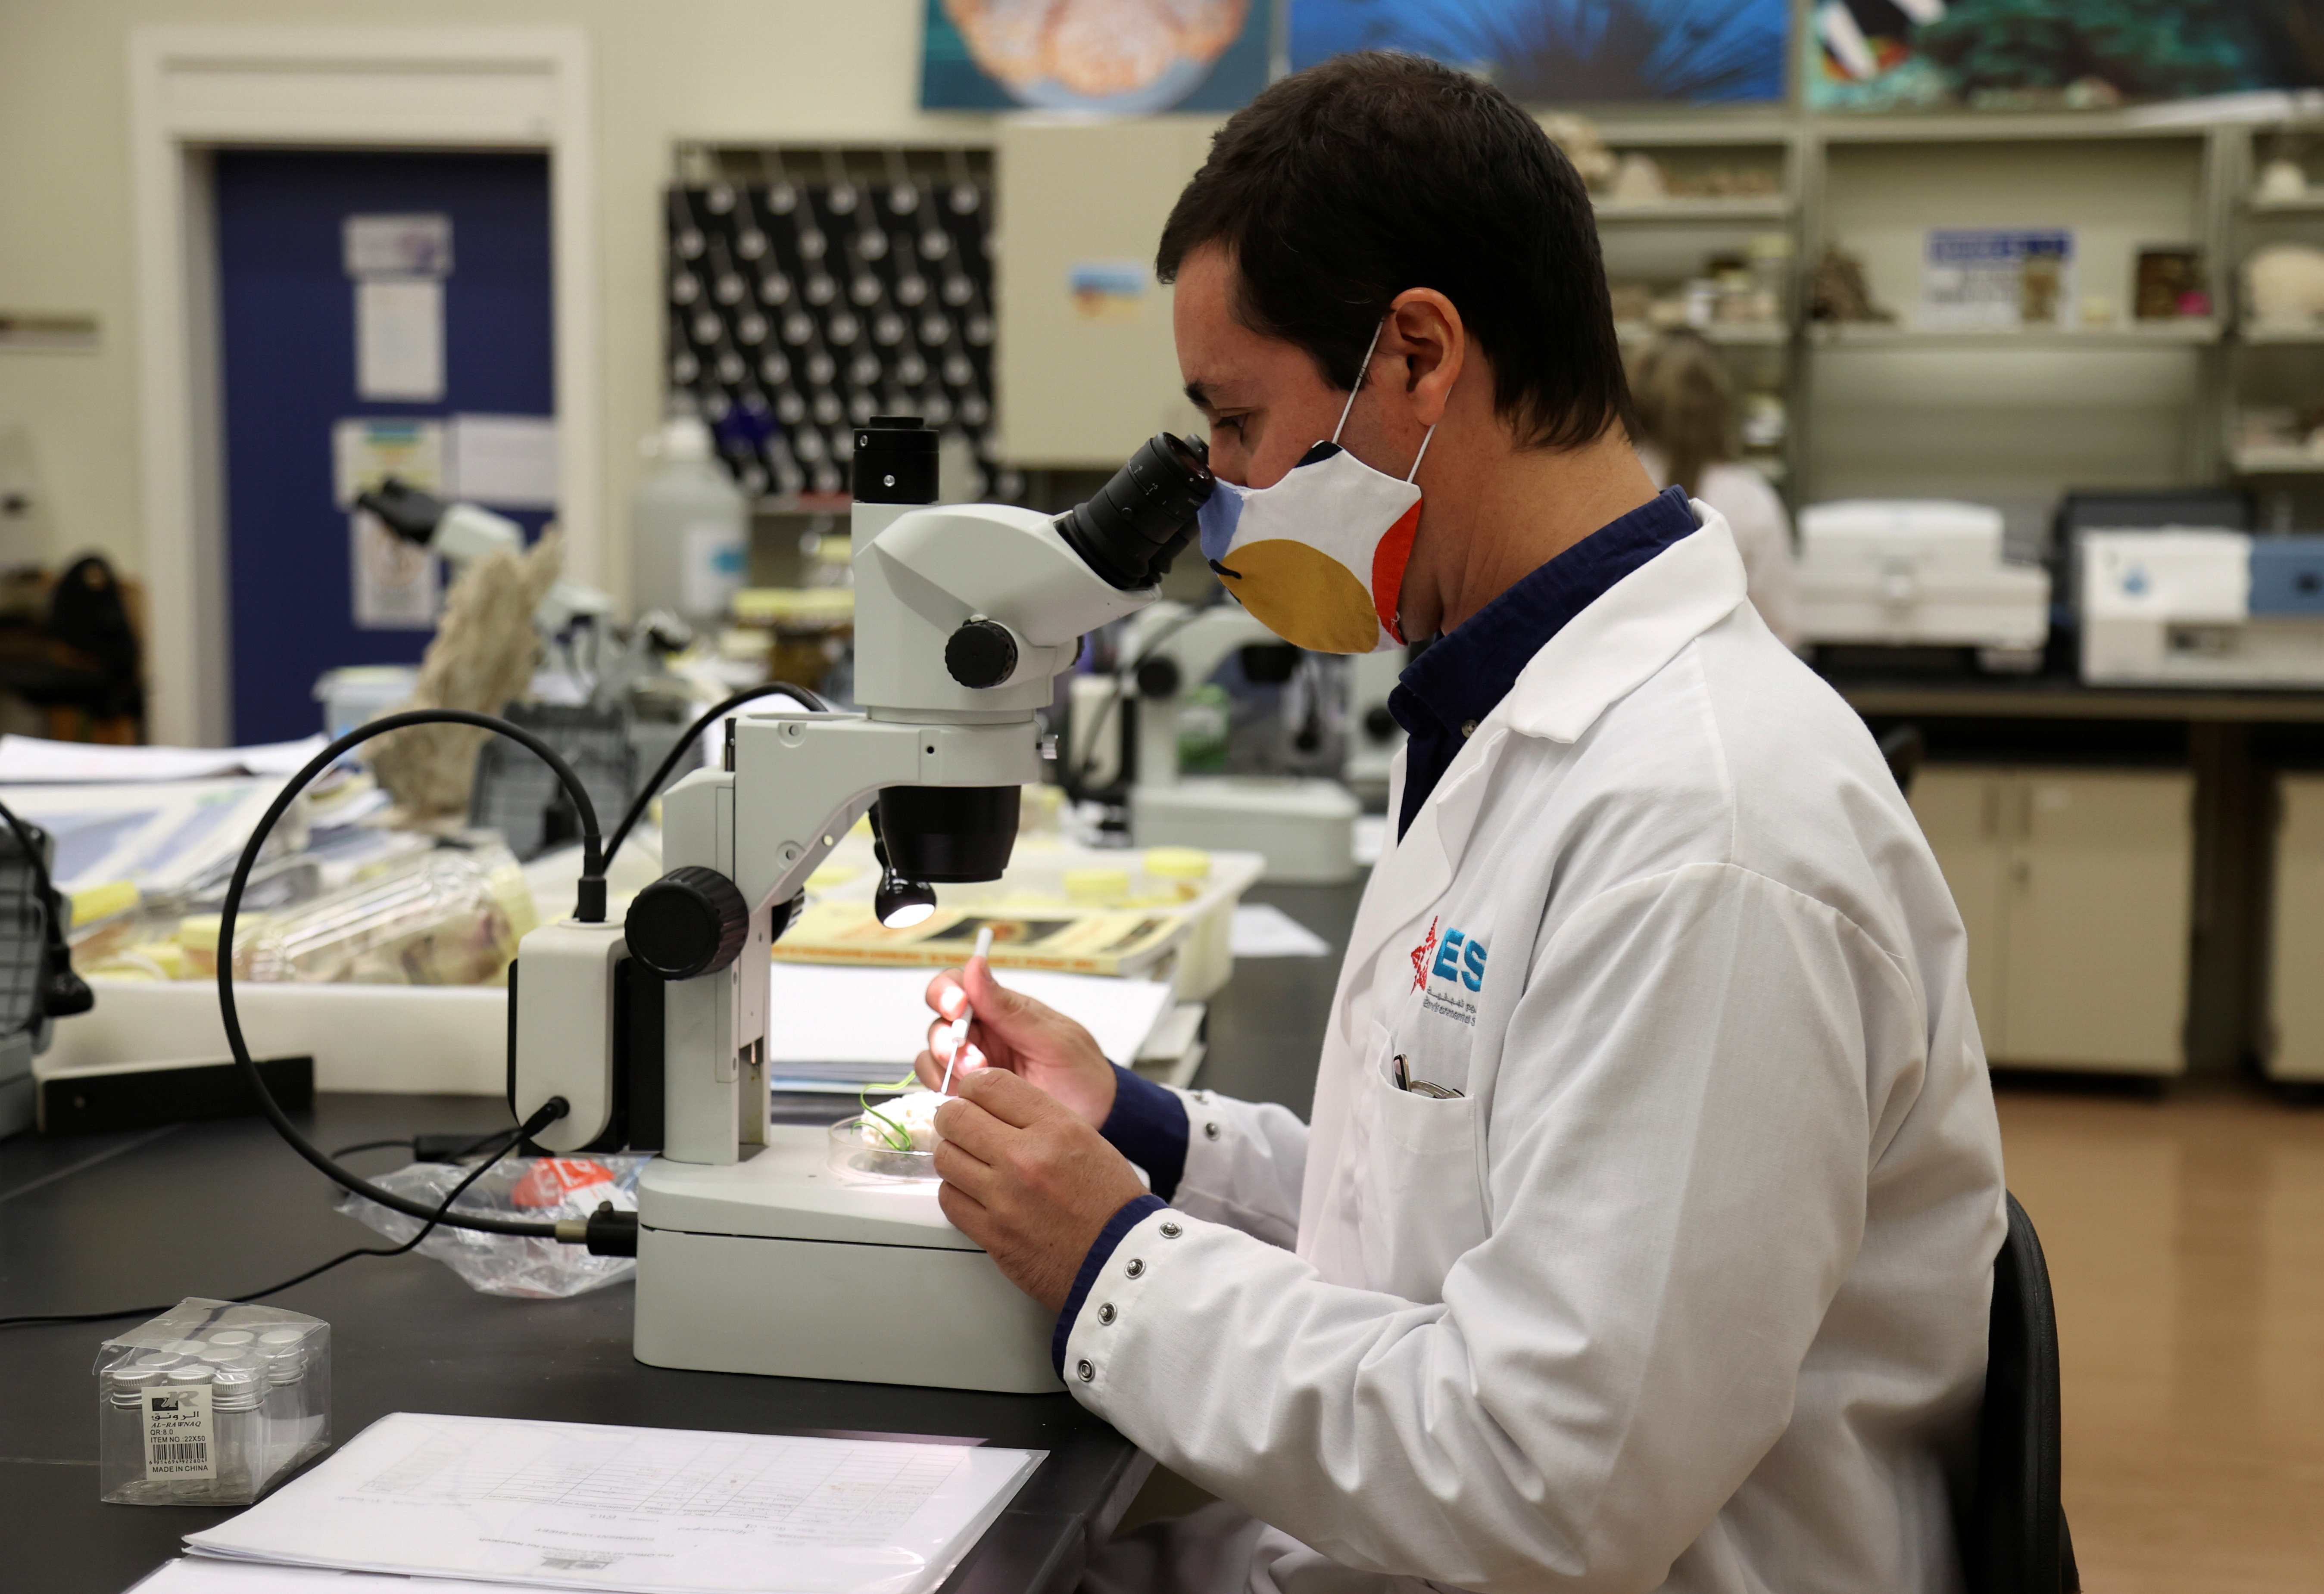 Dr. Pedro Range, research assistant professor, looks into a microscope at Qatar University Marine Biology Laboratory, in Doha, Qatar February 14, 2021. Picture taken February 14, 2021. REUTERS/Ibraheem Al Omari